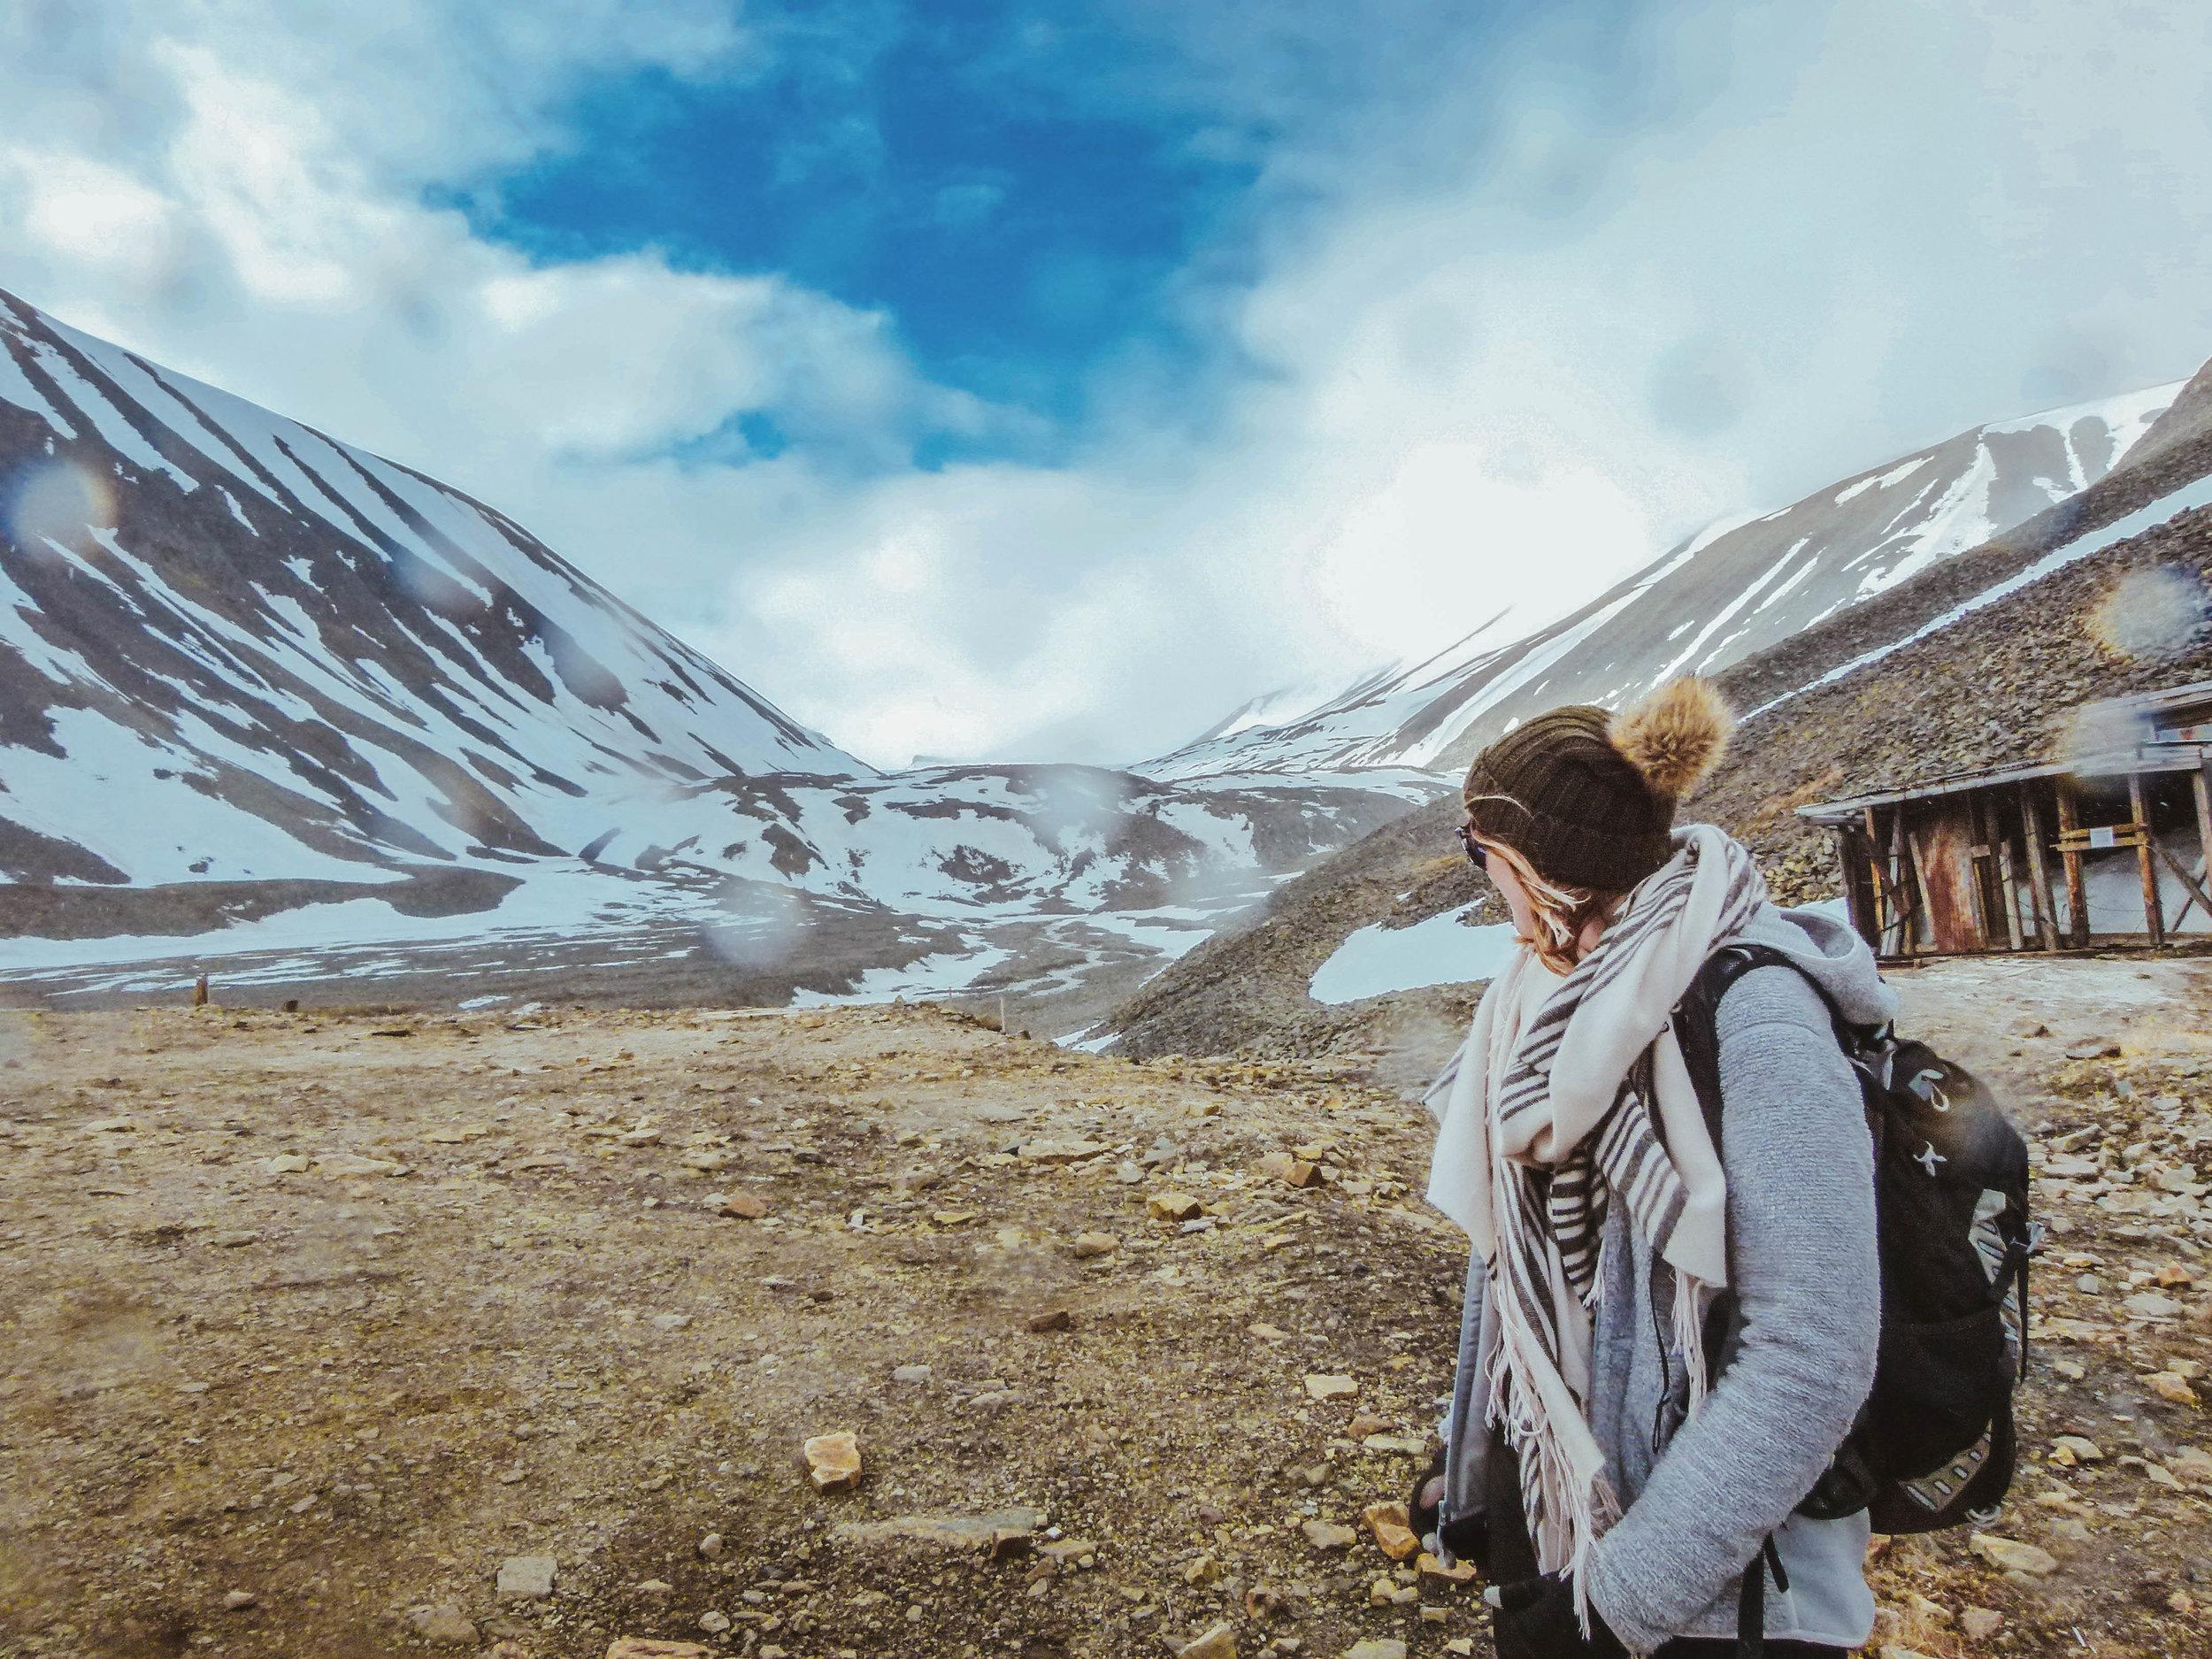 Me and my fleece jacket, exploring Svalbard